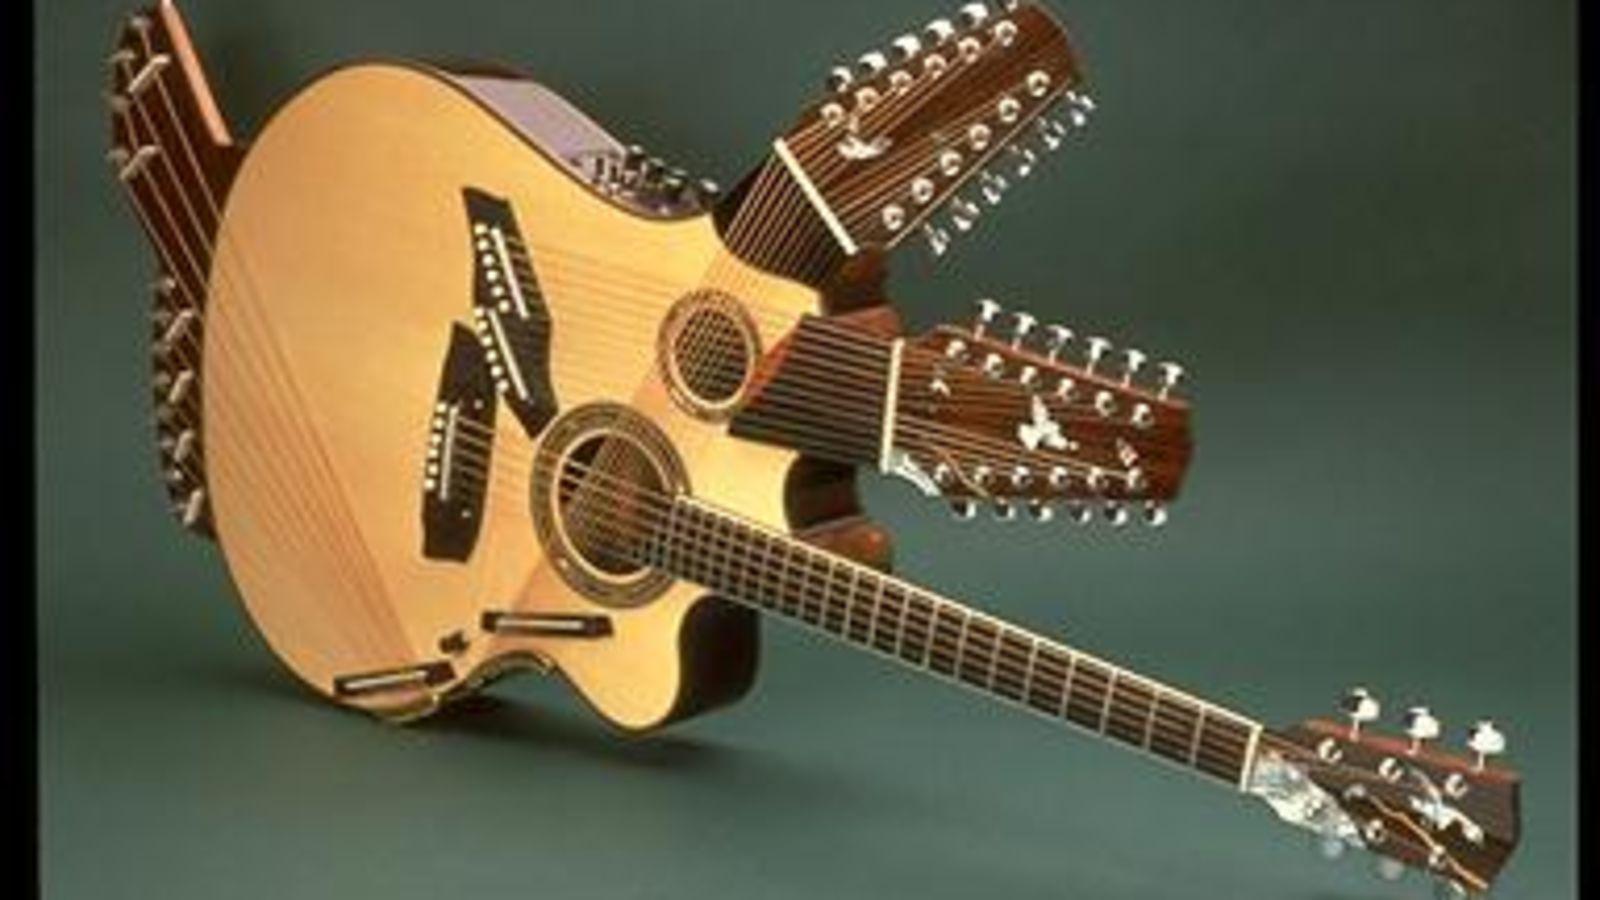 pikasso guitar.jpg